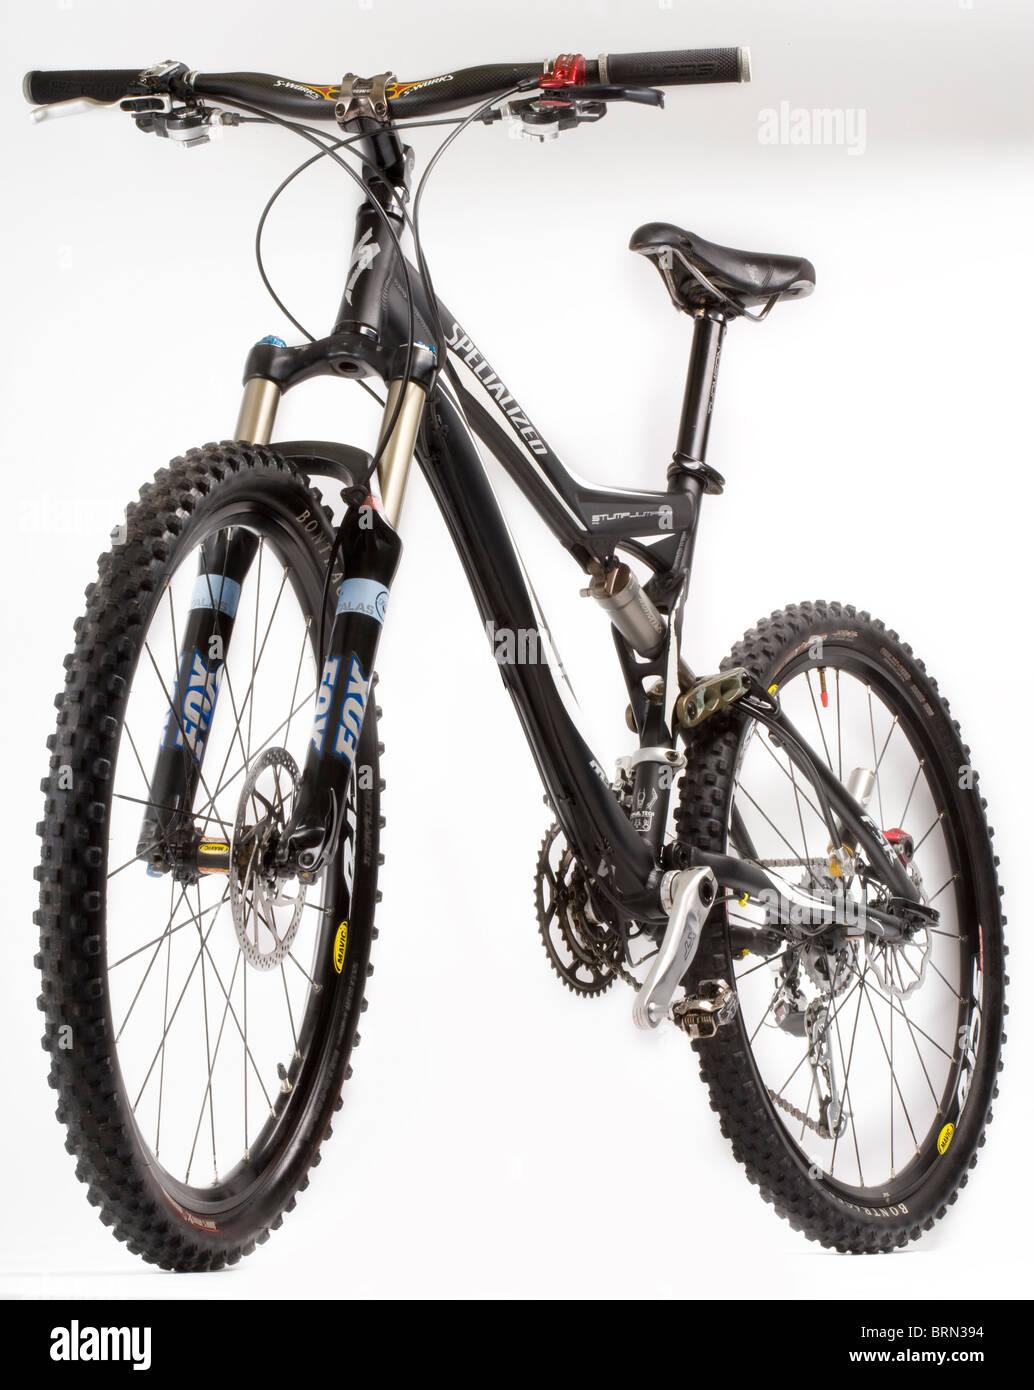 Dual Suspension Mountain Bike >> Dual Suspension Mountain Bike Stock Photo 31811056 Alamy